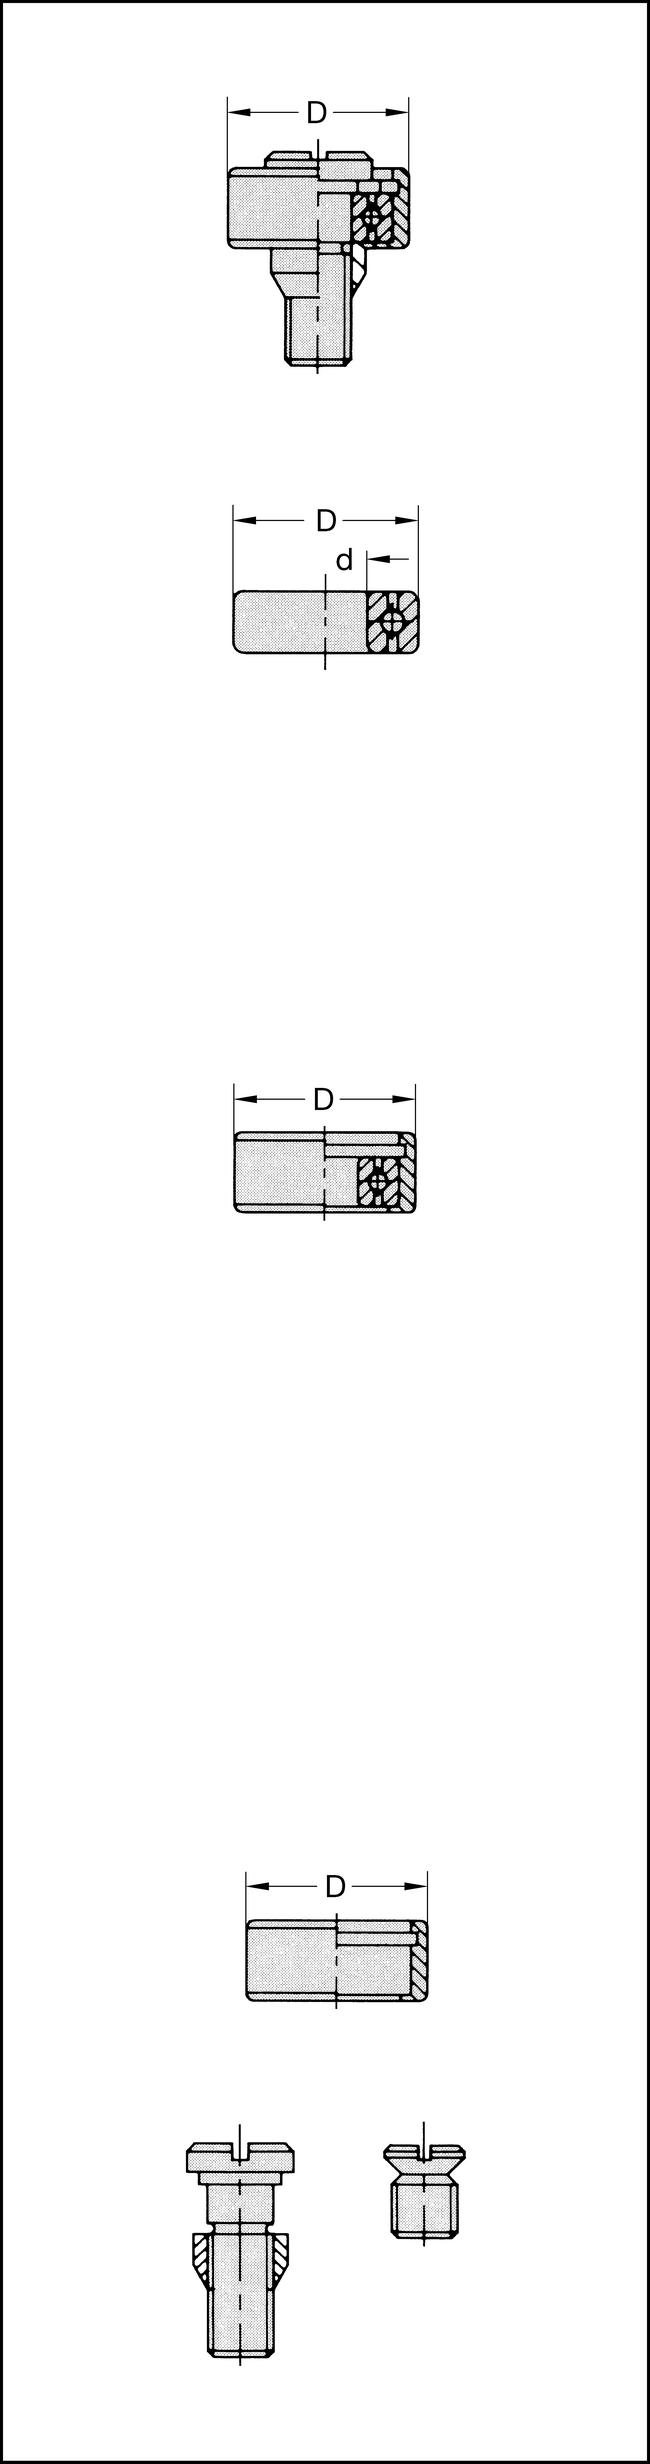 Kugellager 9x4mm d=4mm